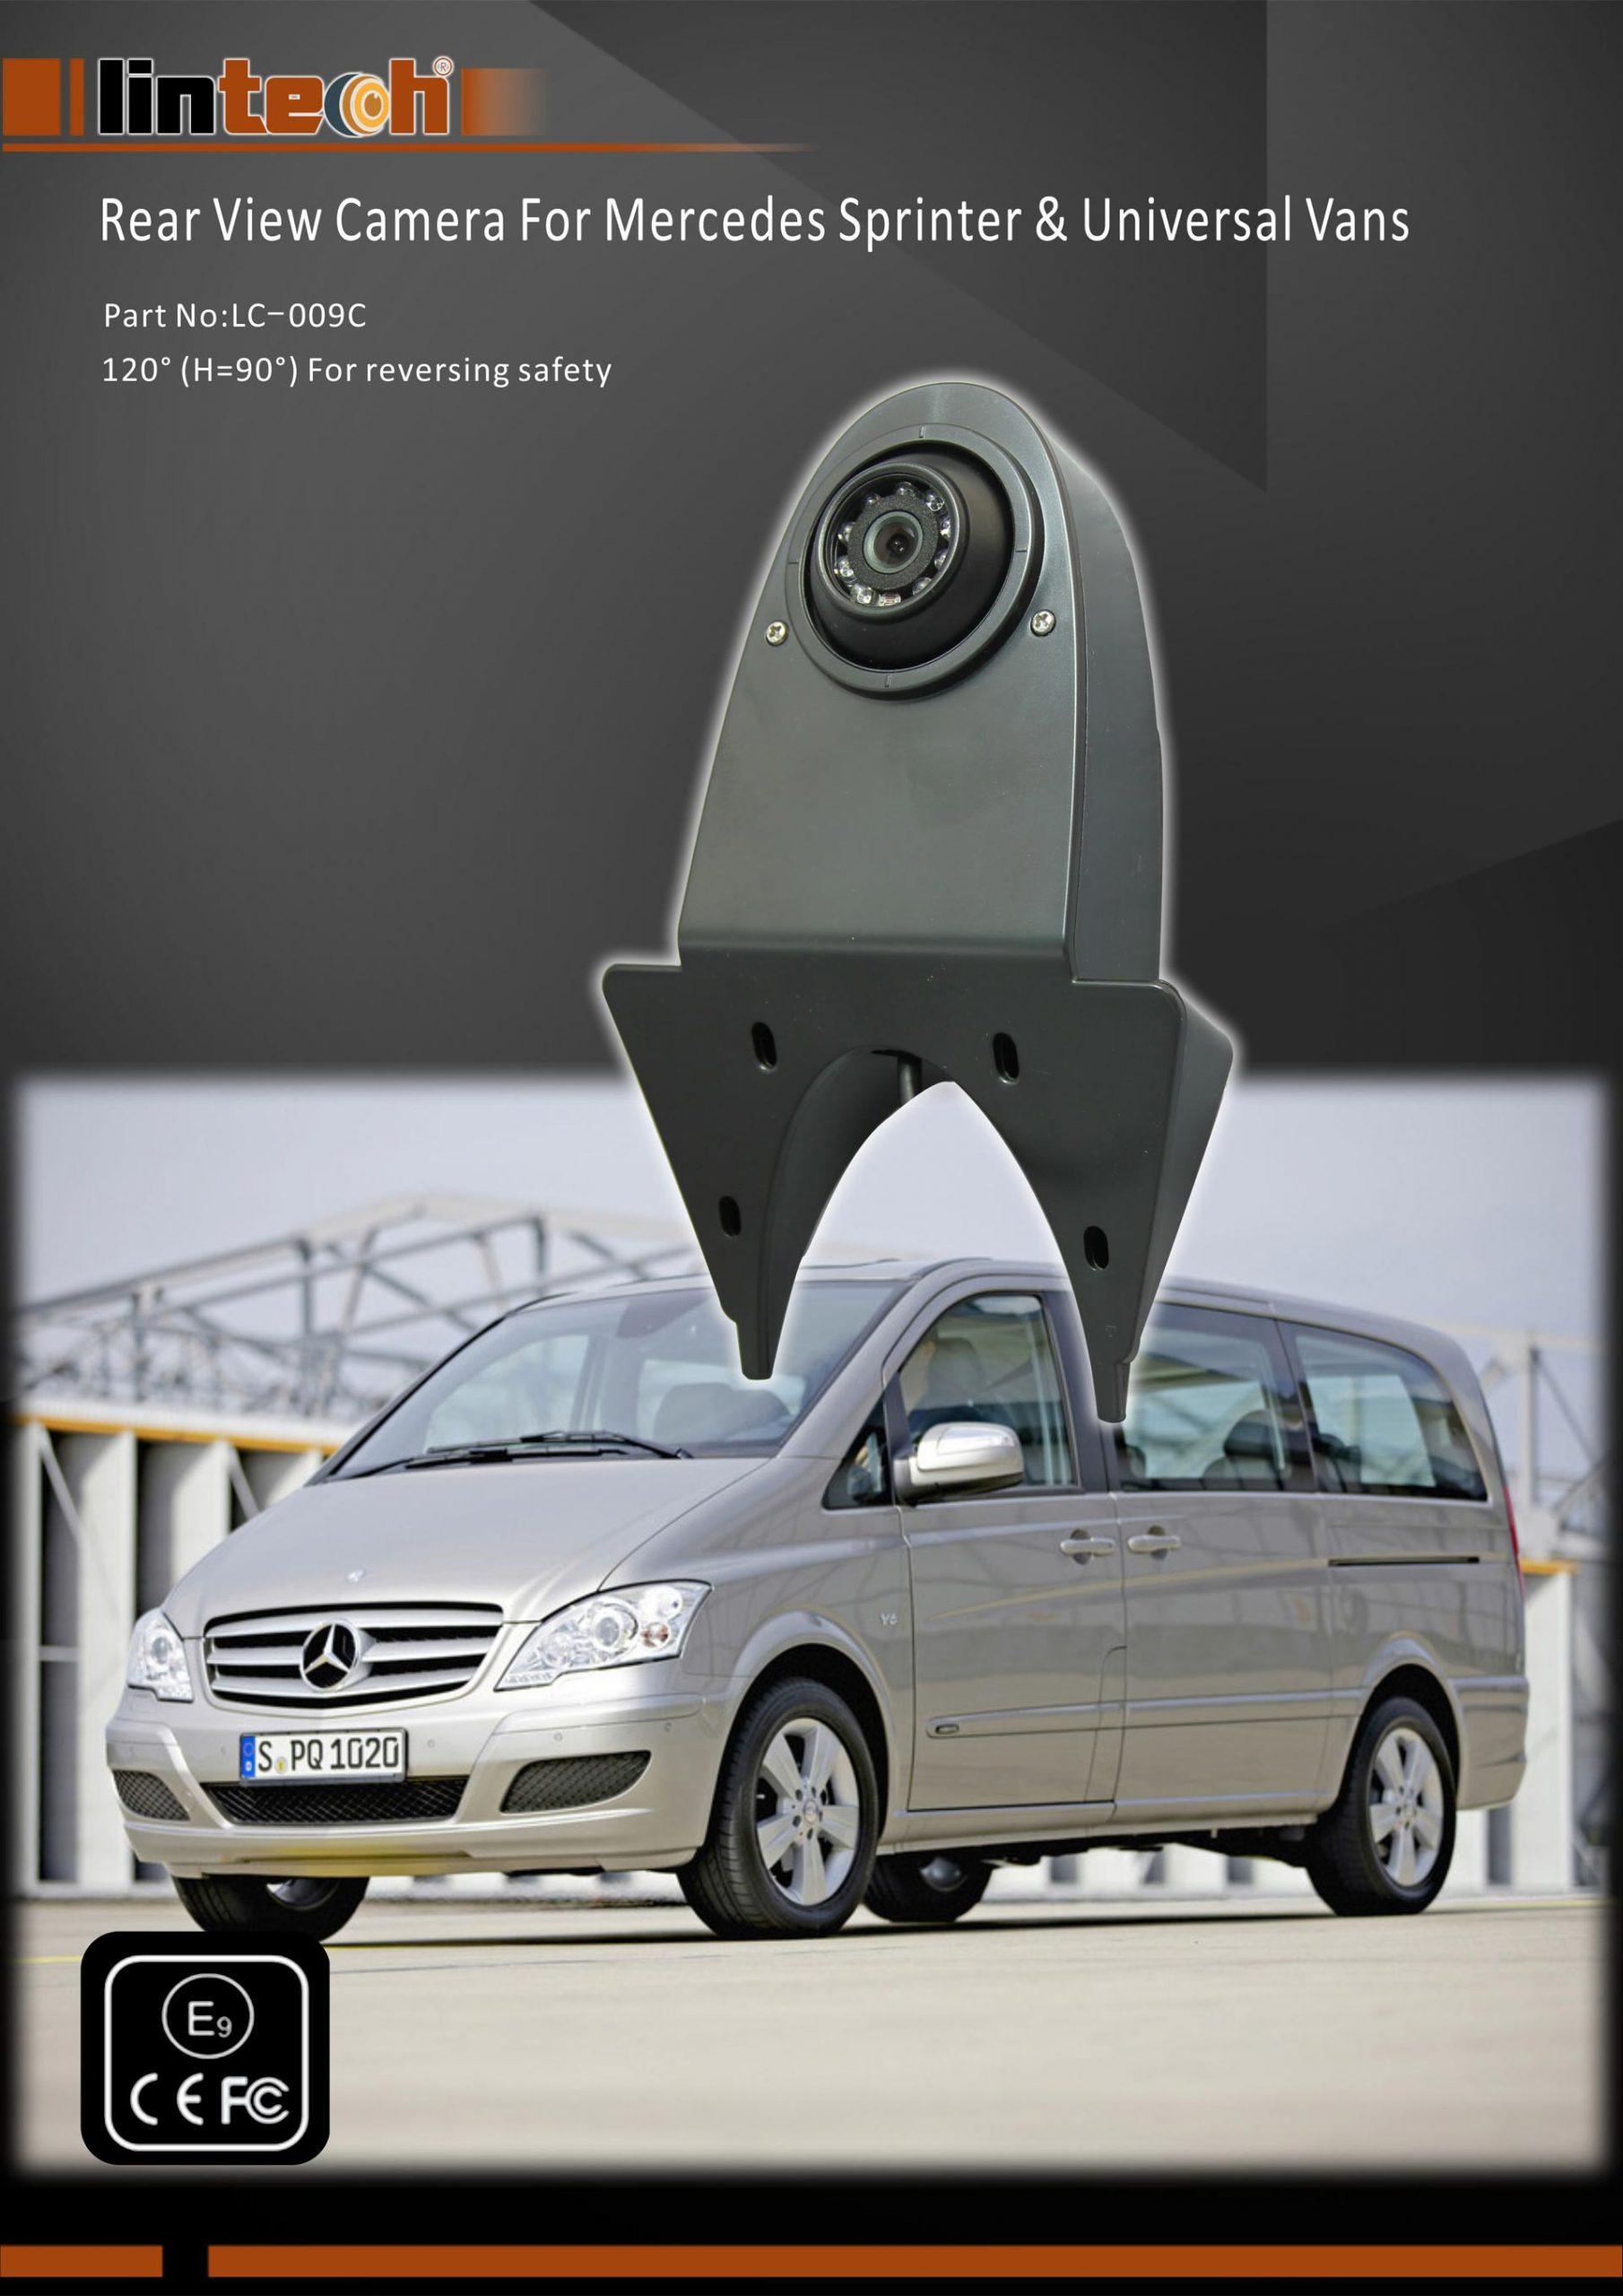 1.Rear View Camera For Mercedes Sprinter & Universal Vans